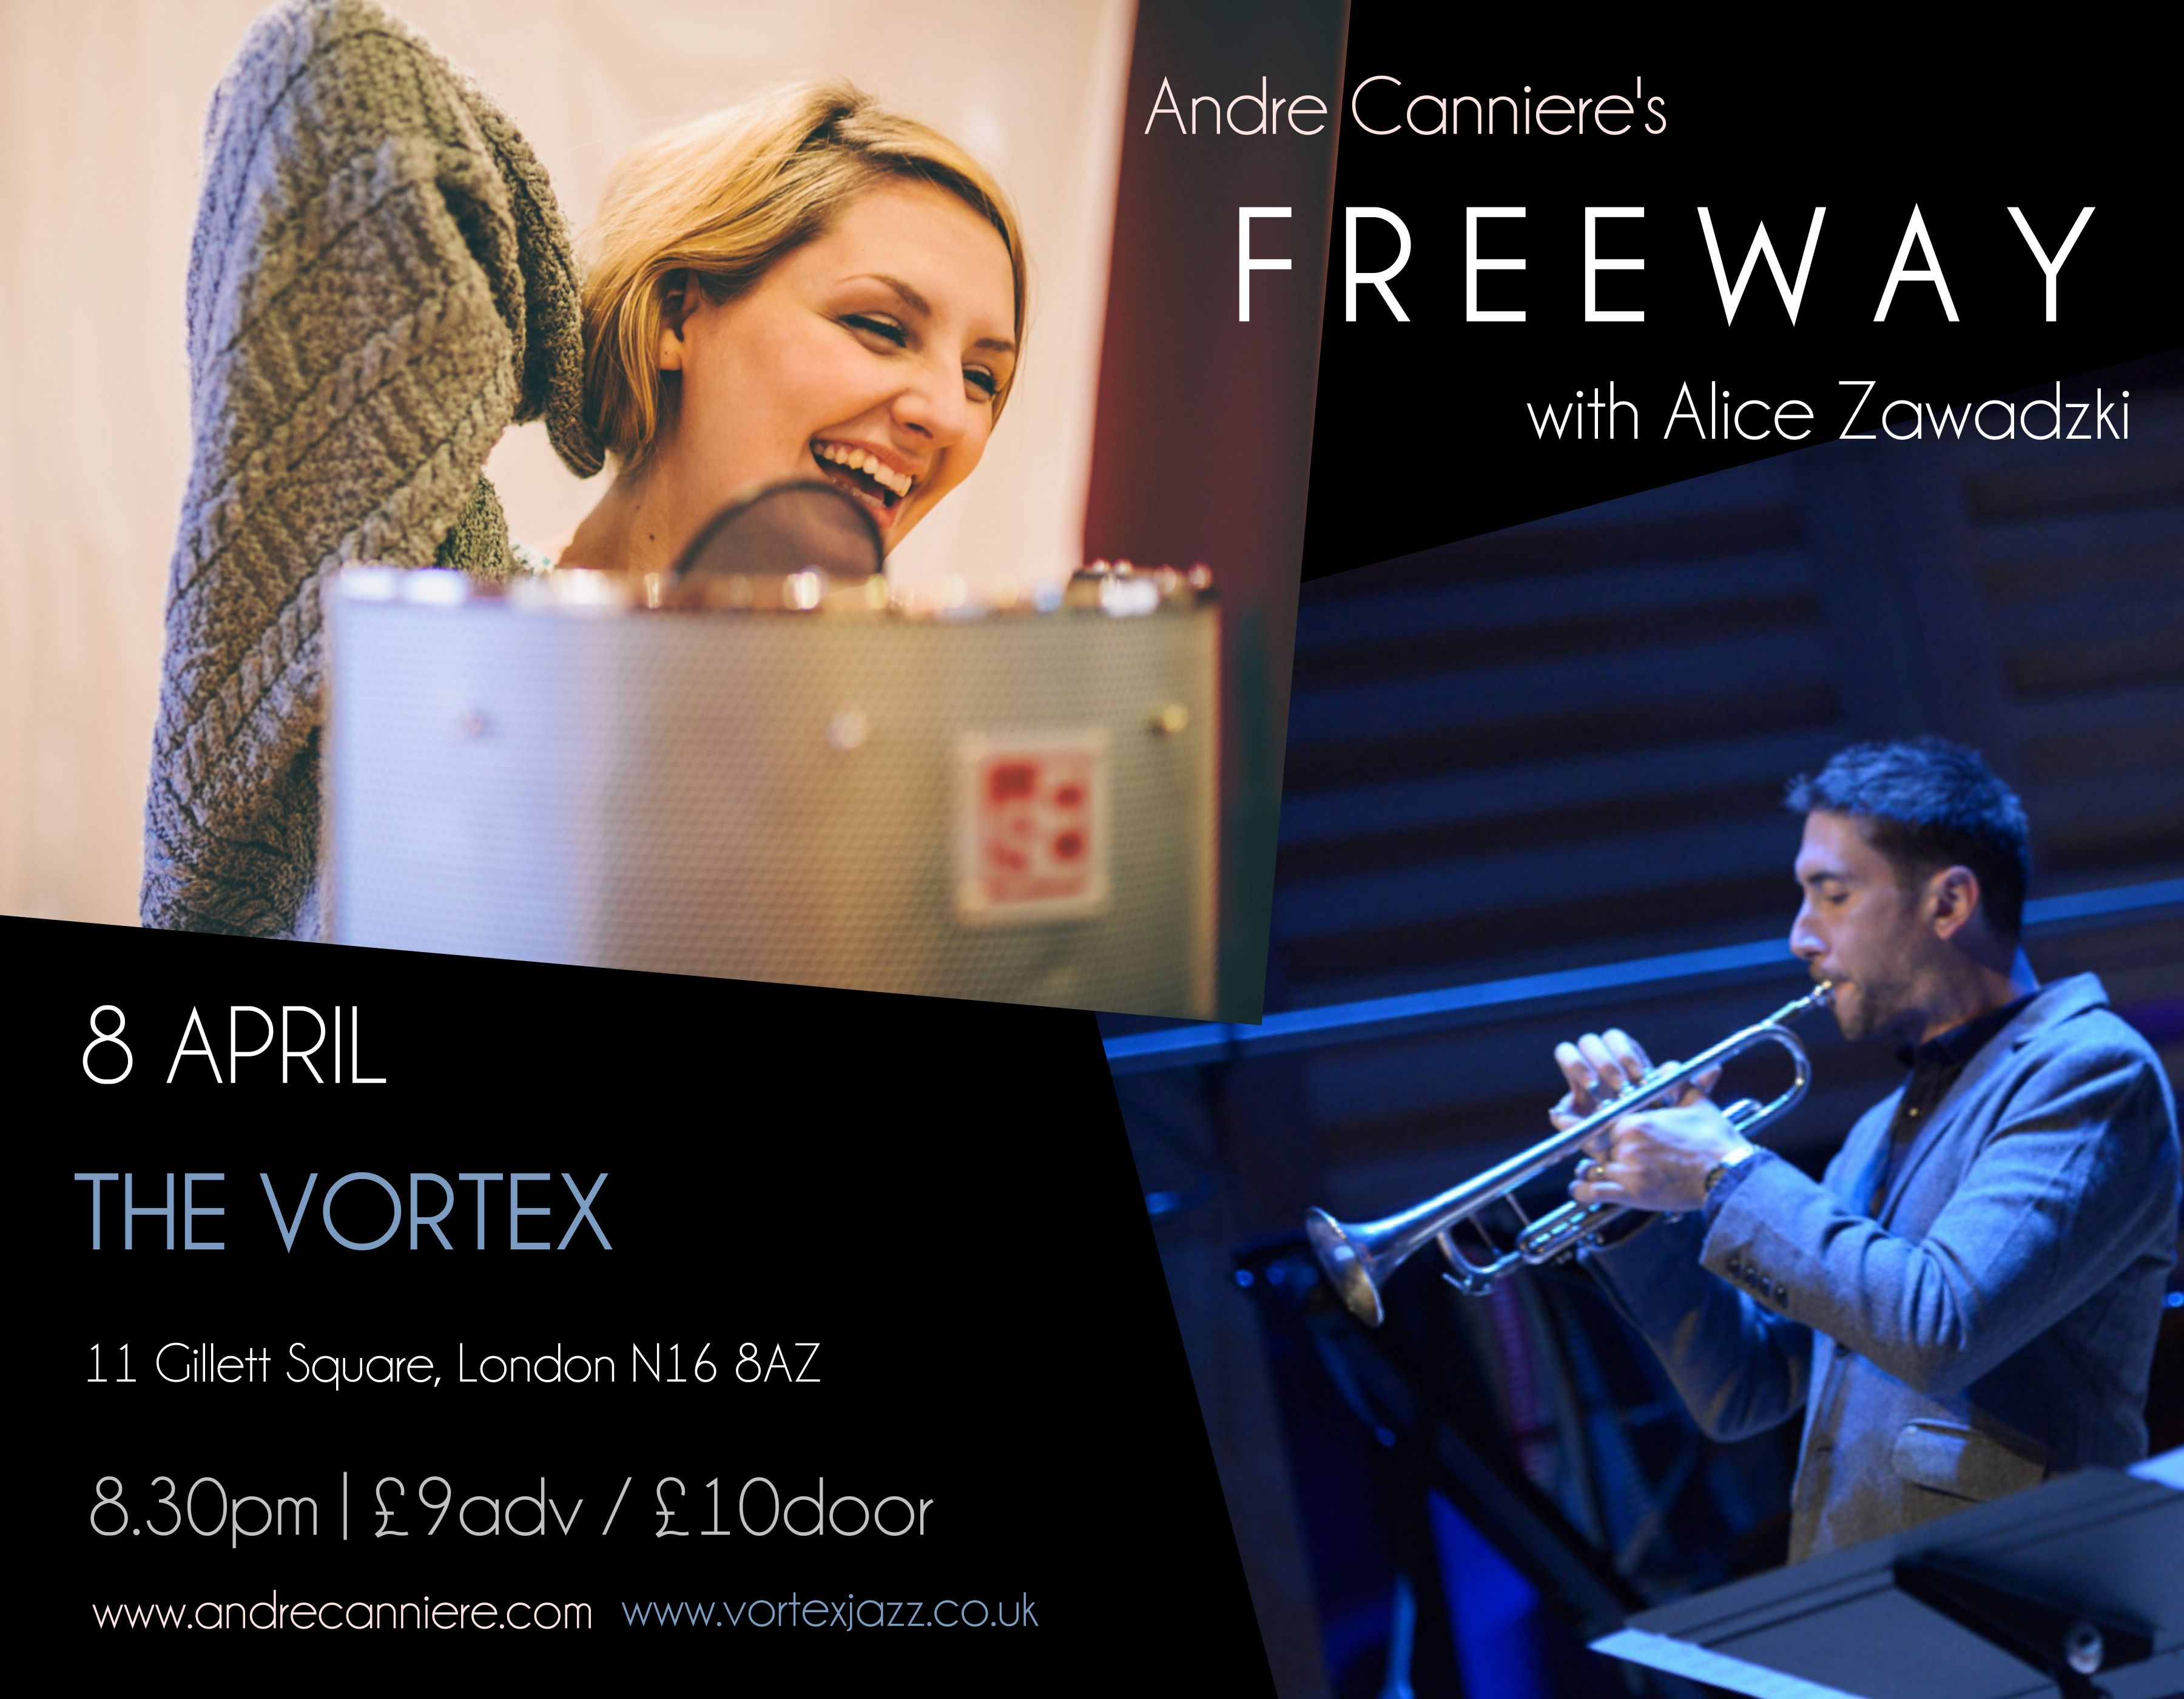 Freeway at The Vortex April 8th (with Alice Zawadzki)